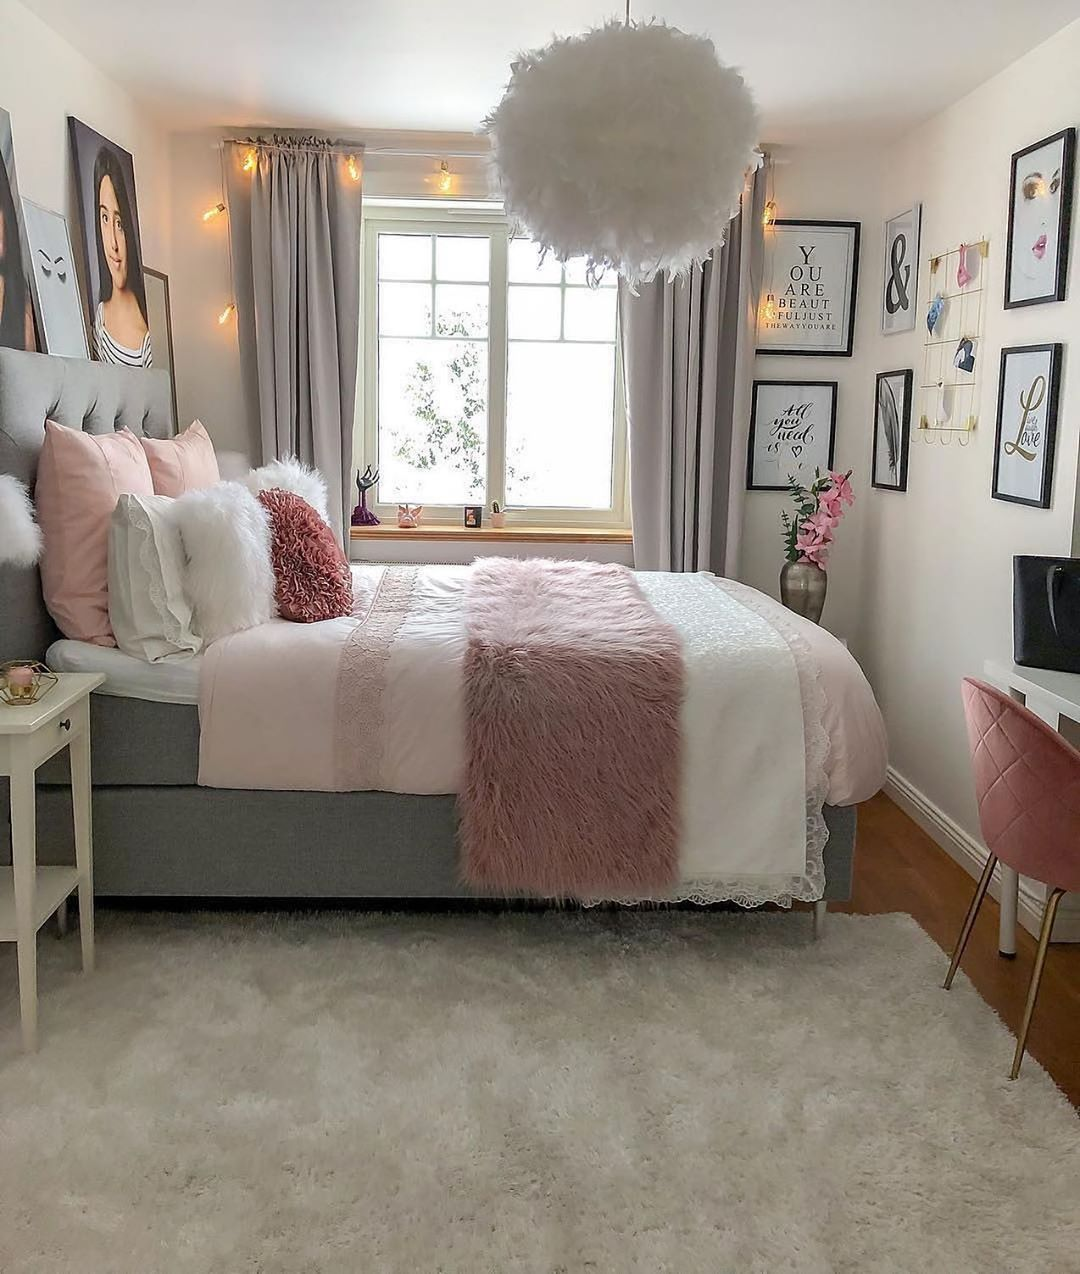 Bedroom Inspiration Cuddly Soft Luxury Bed Linen From Royfort